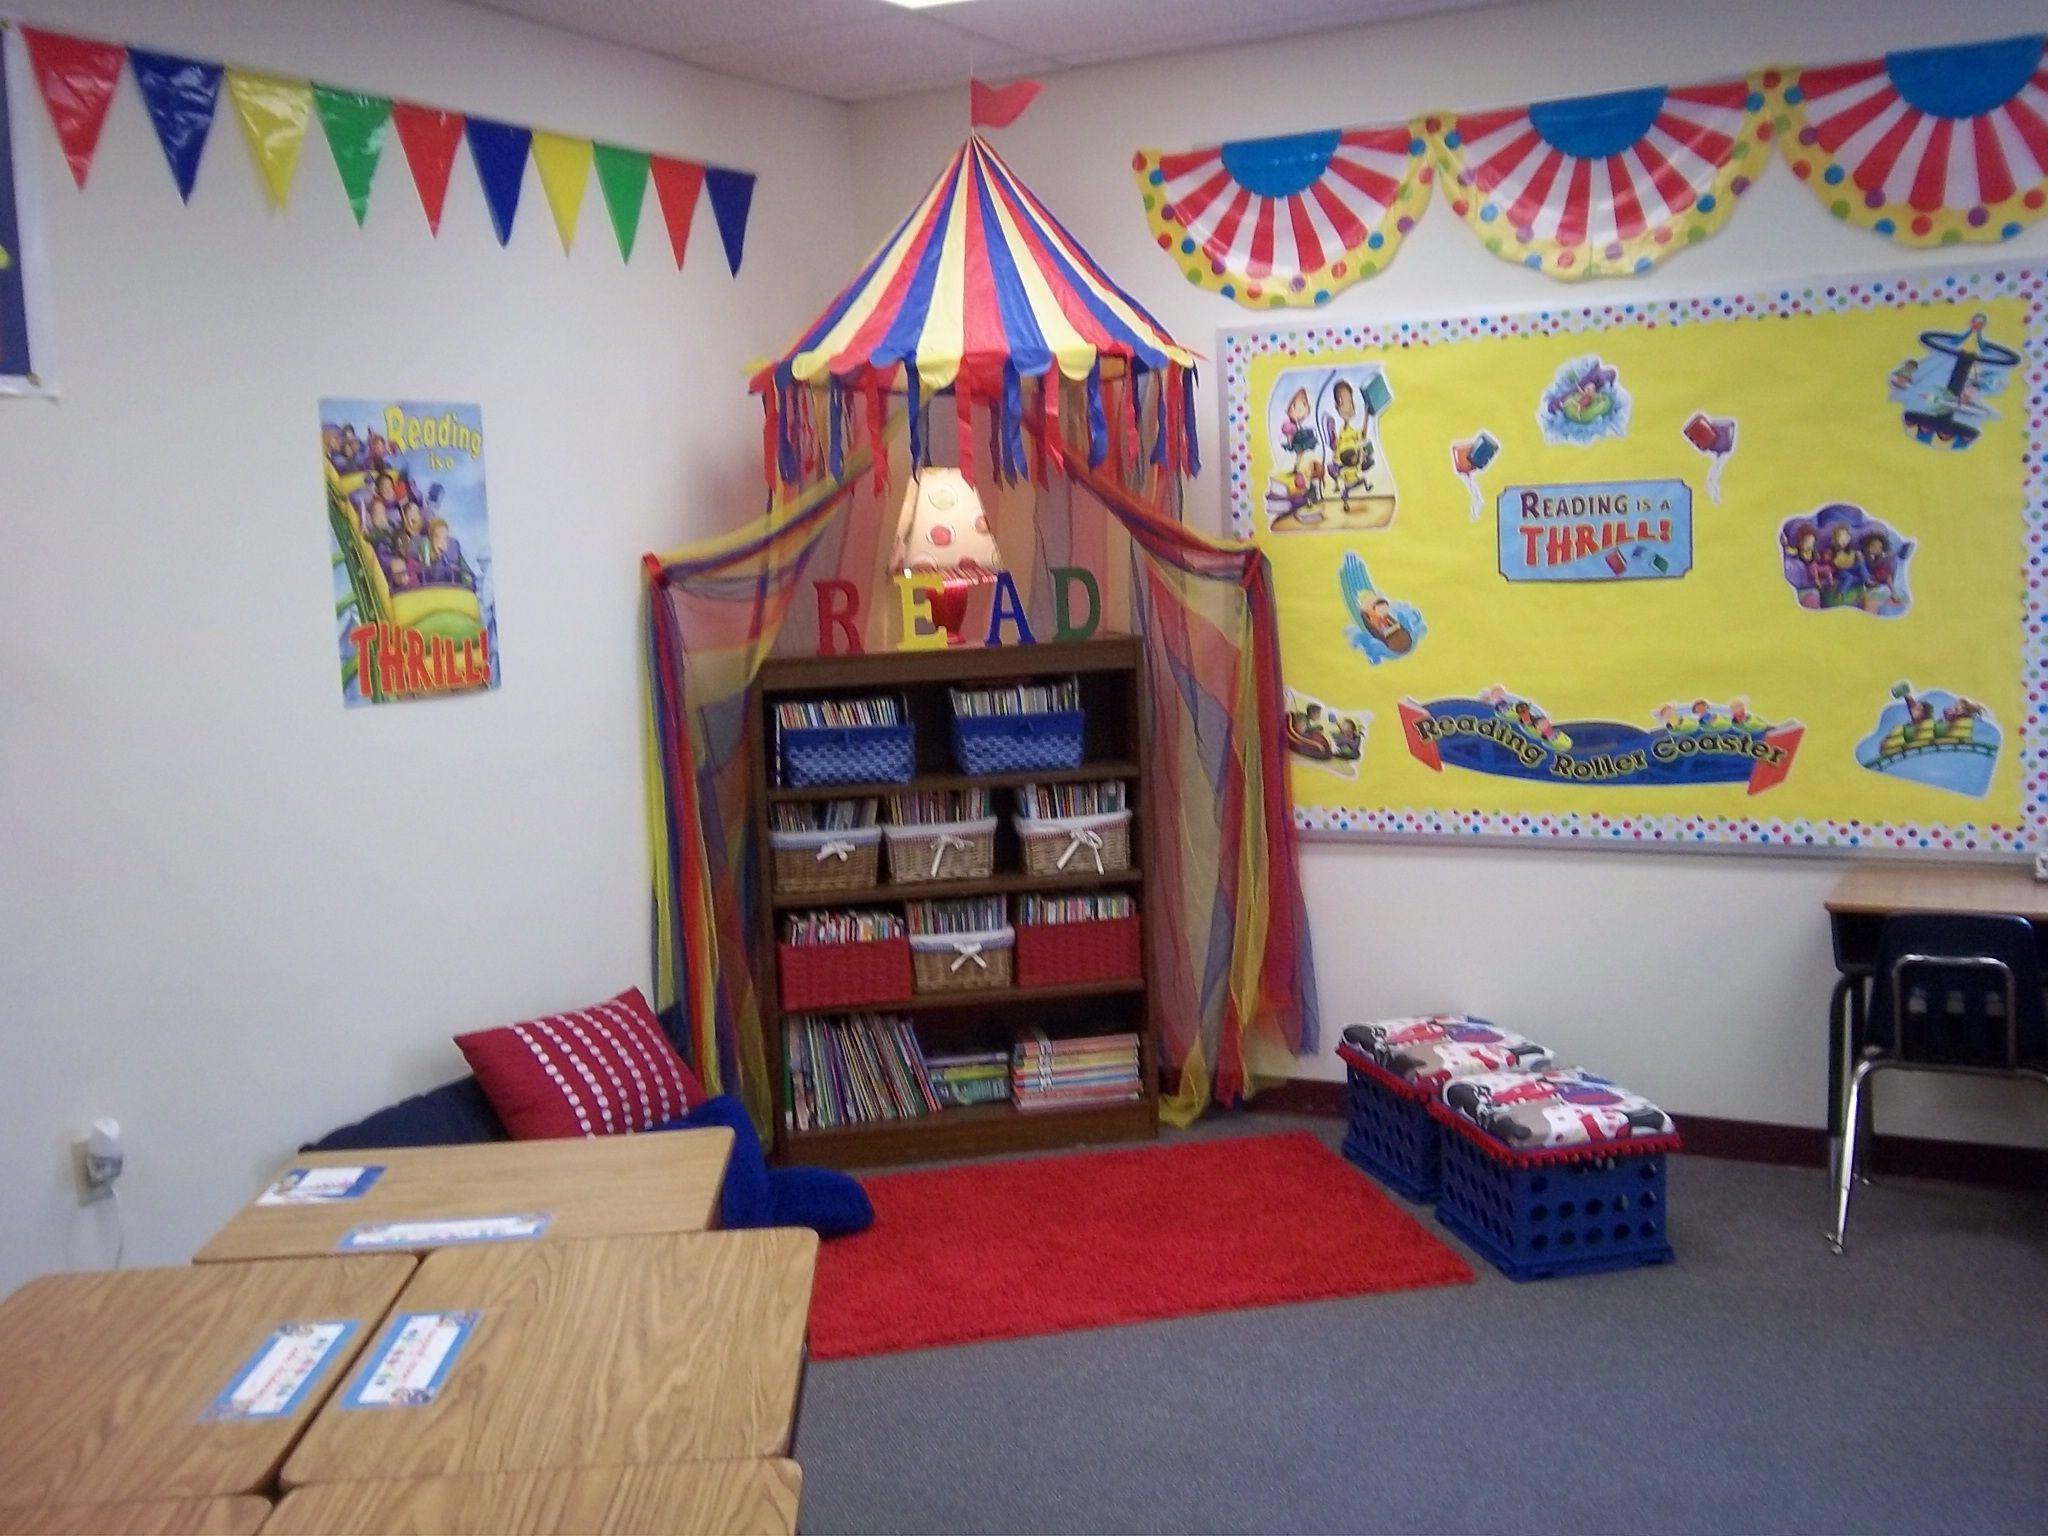 Circus Classroom Decoration Ideas ~ Carnival themed reading corner classroom decor